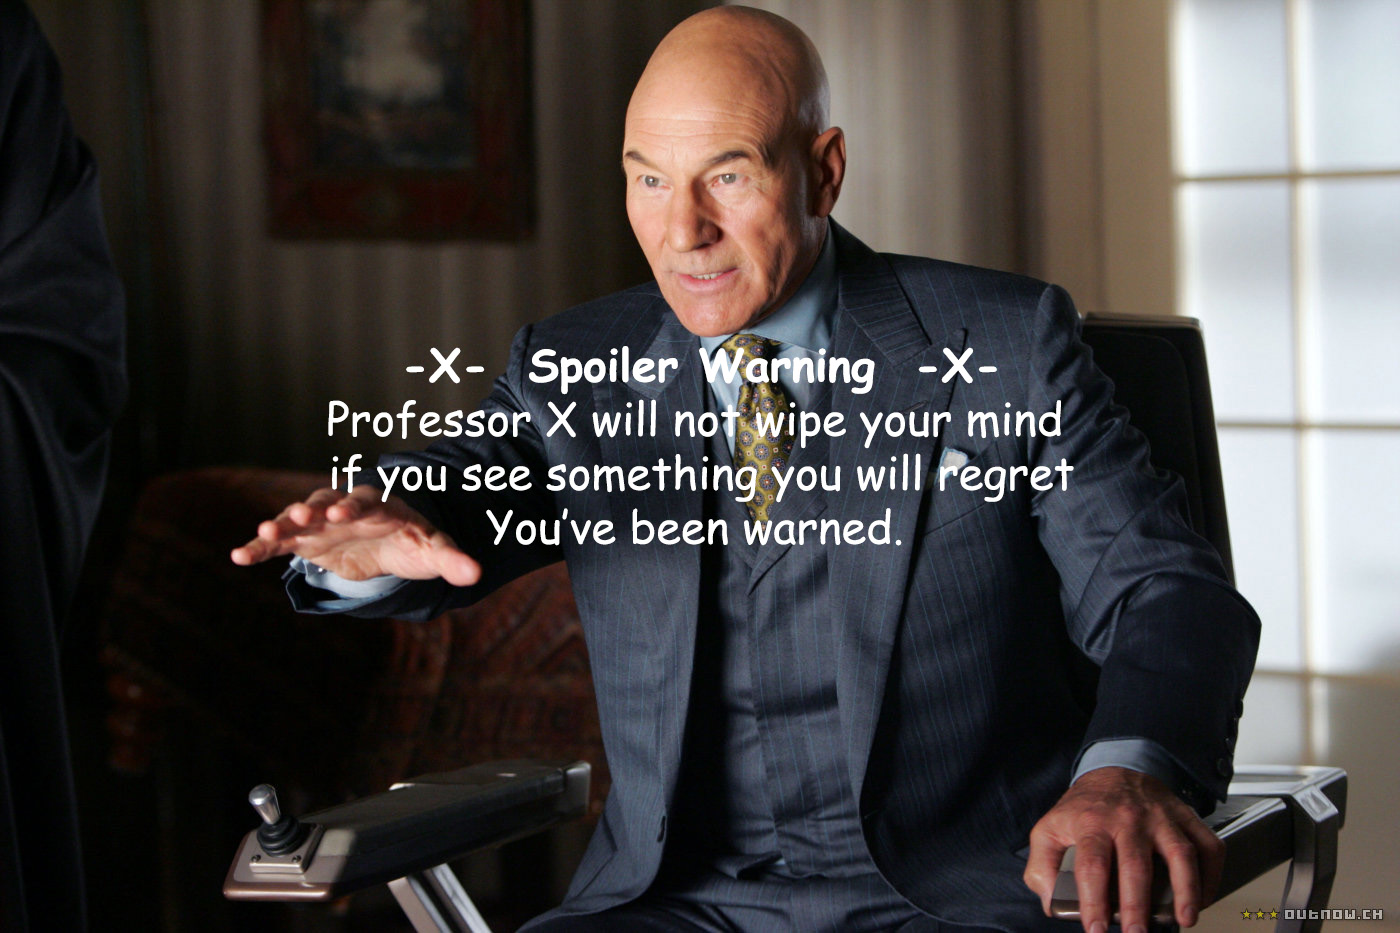 X-men Spoiler Warning